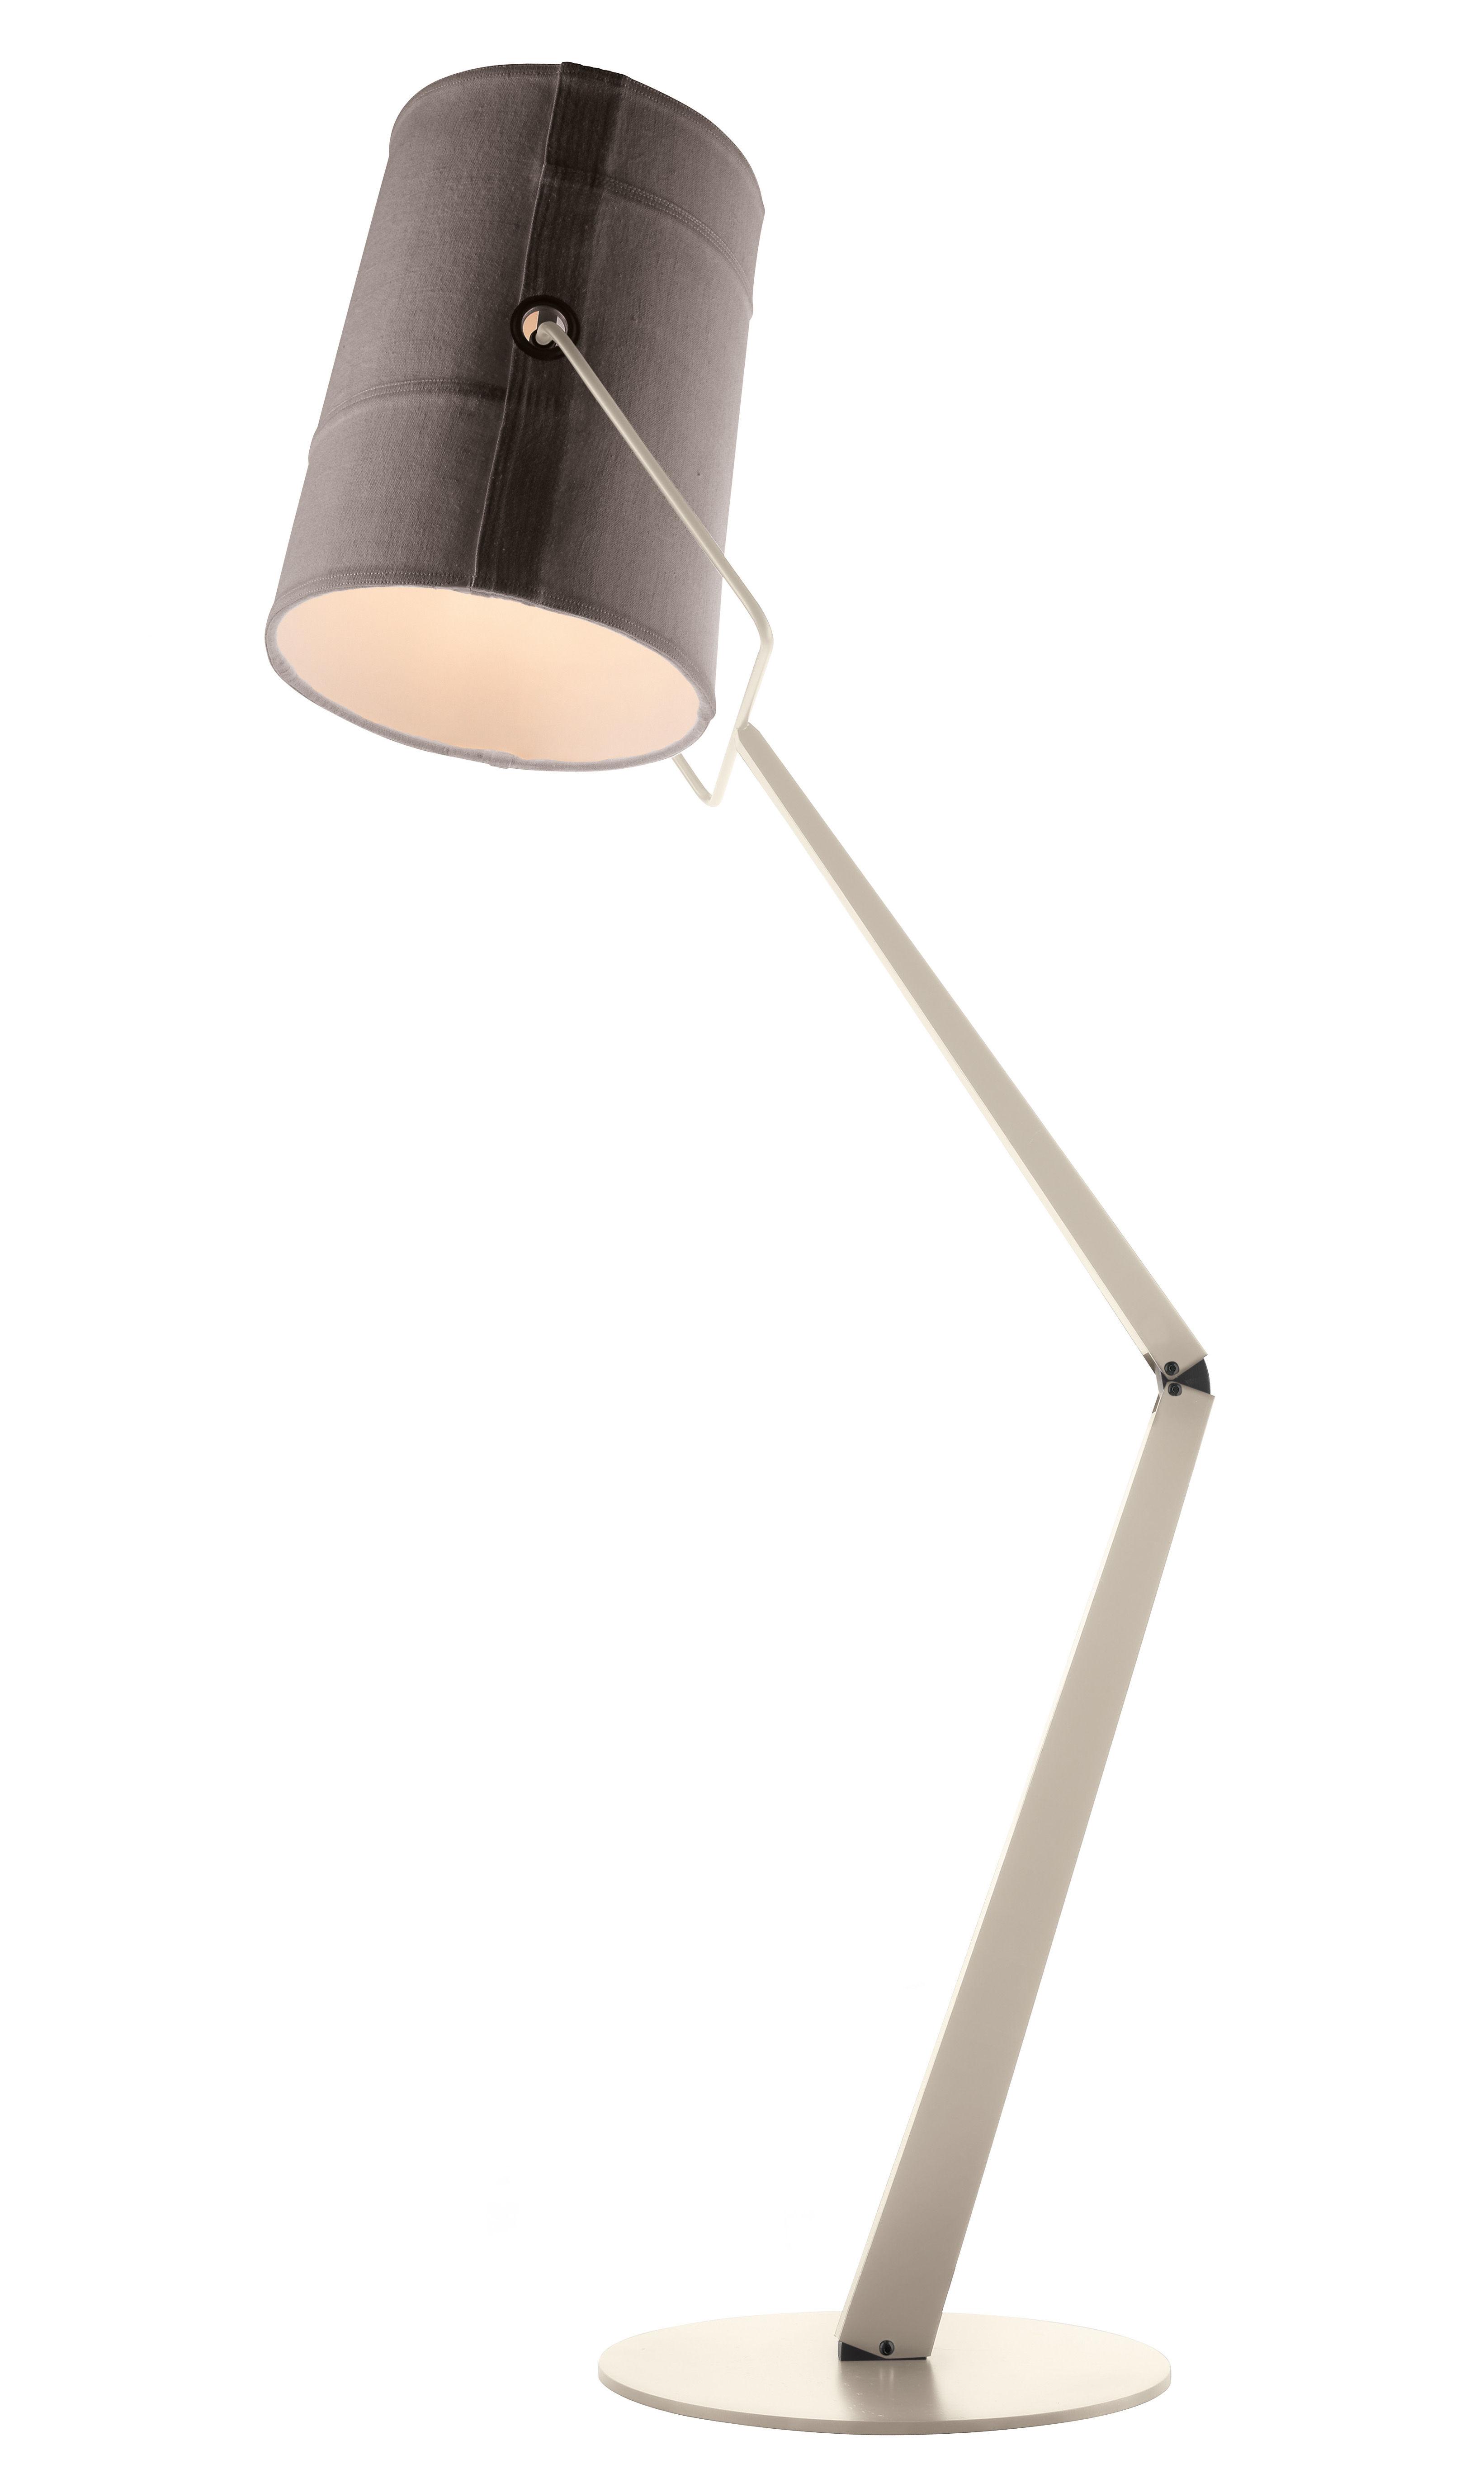 Luminaire - Lampadaires - Lampadaire Fork - Diesel with Foscarini - Gris / Pied ivoire - Métal verni, Tissu